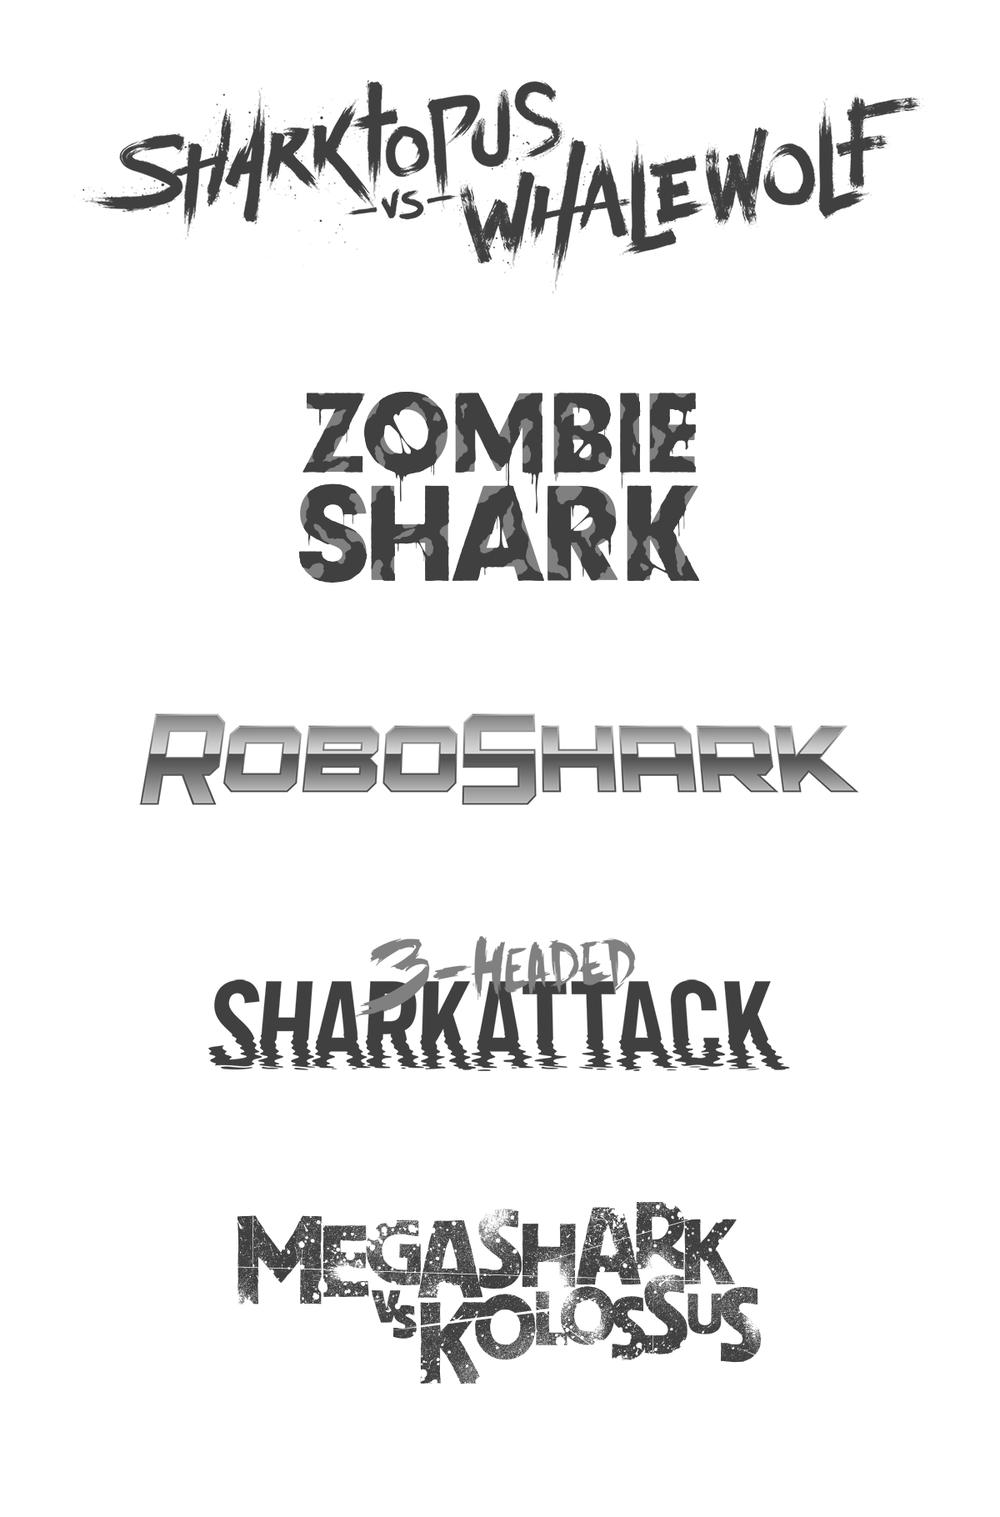 sharknado_logos.png